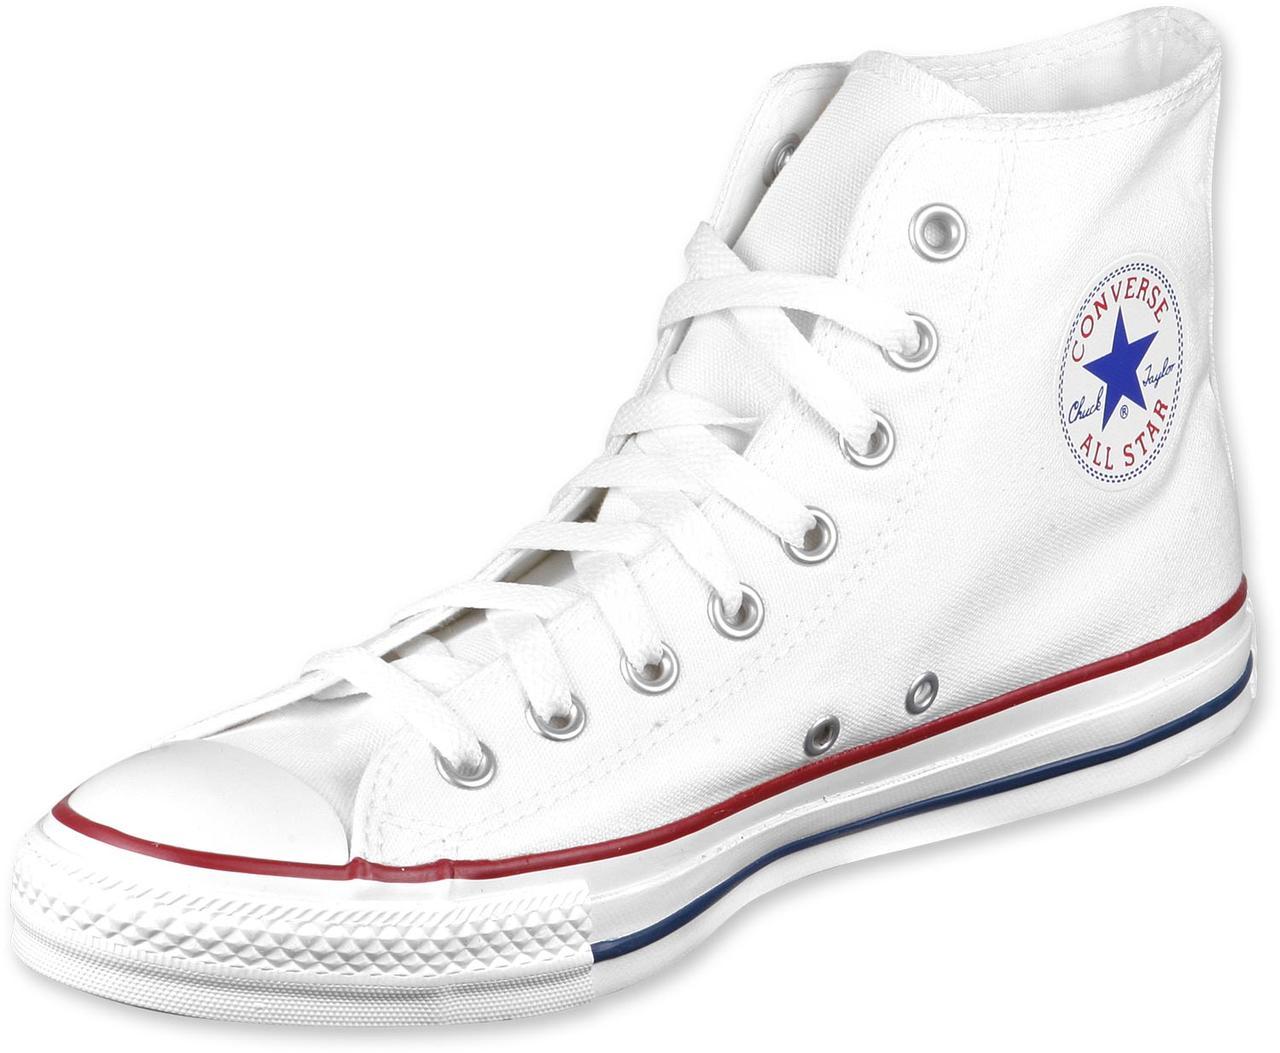 ed96ca9f2e33 Конверс высокие белые кеды Converse High White All Star Chuck Taylor  подростковые женские, ...